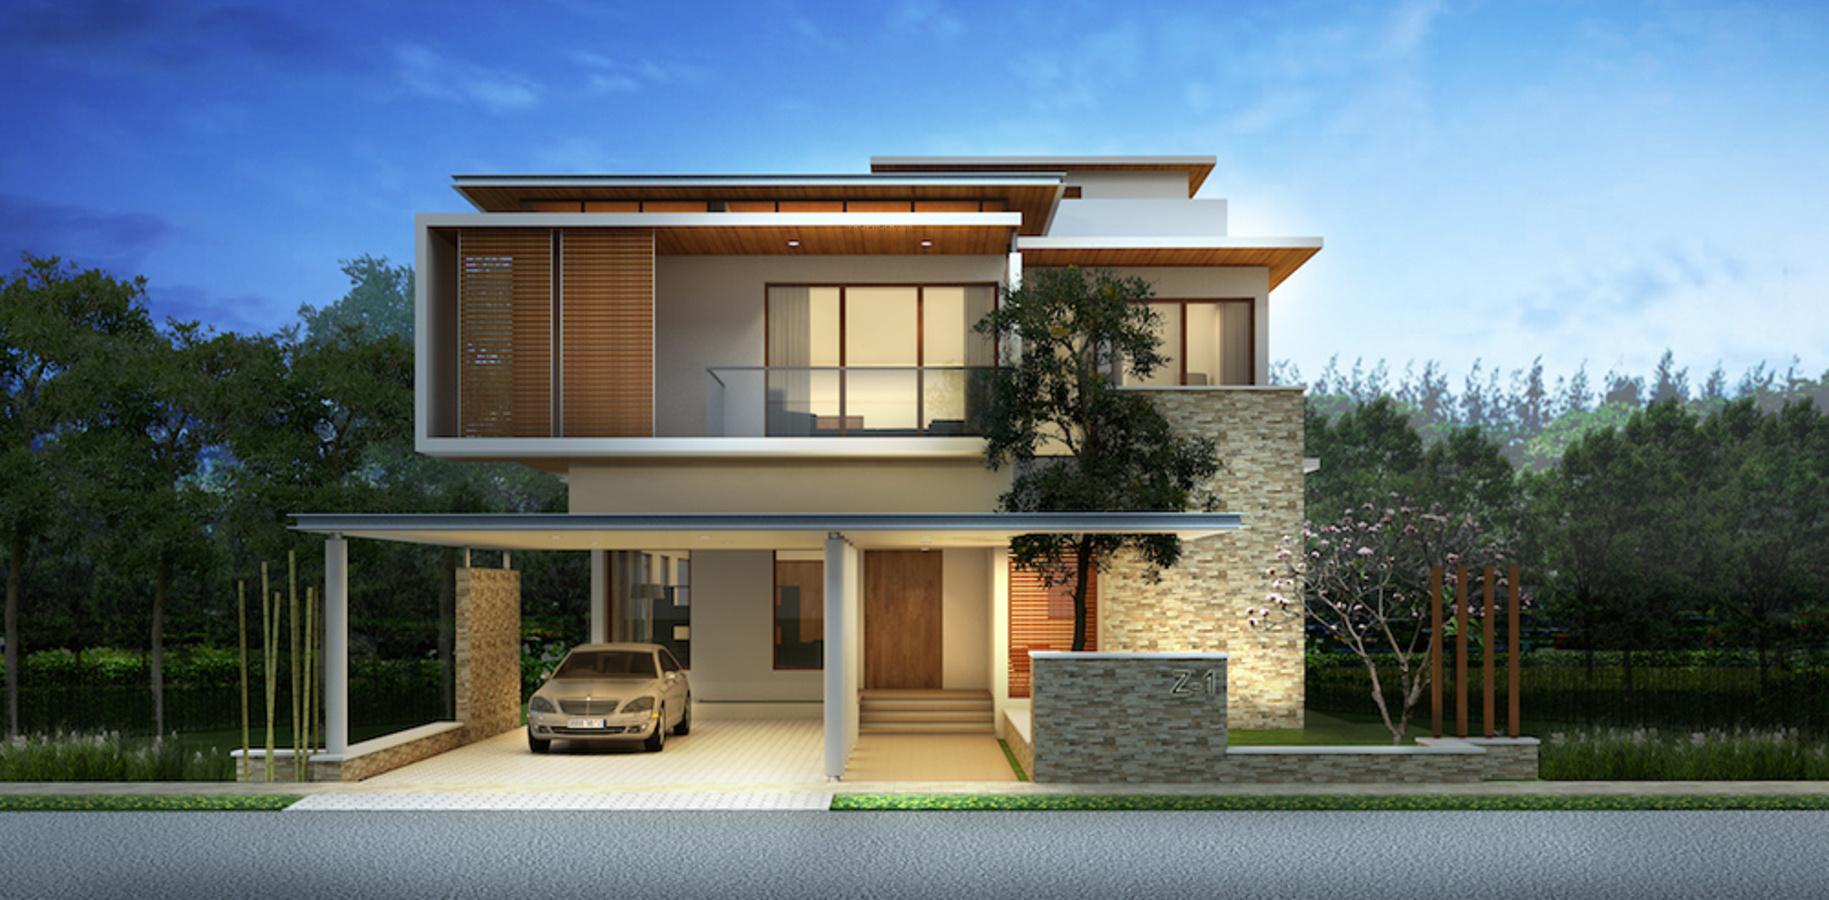 Main elevation image 2 of mantri group signature villa for Villas elevations photo gallery